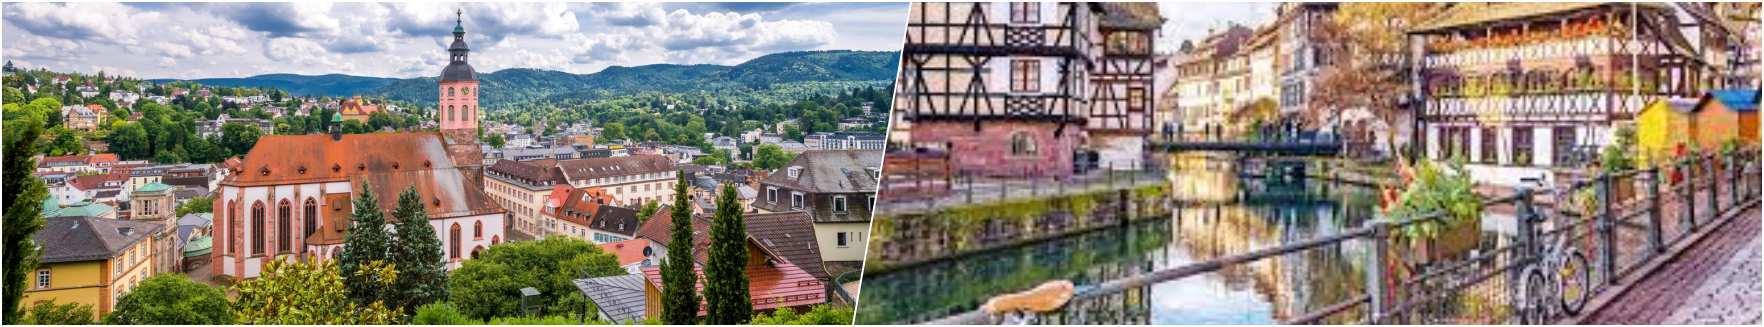 Baden Baden - Strasbourg